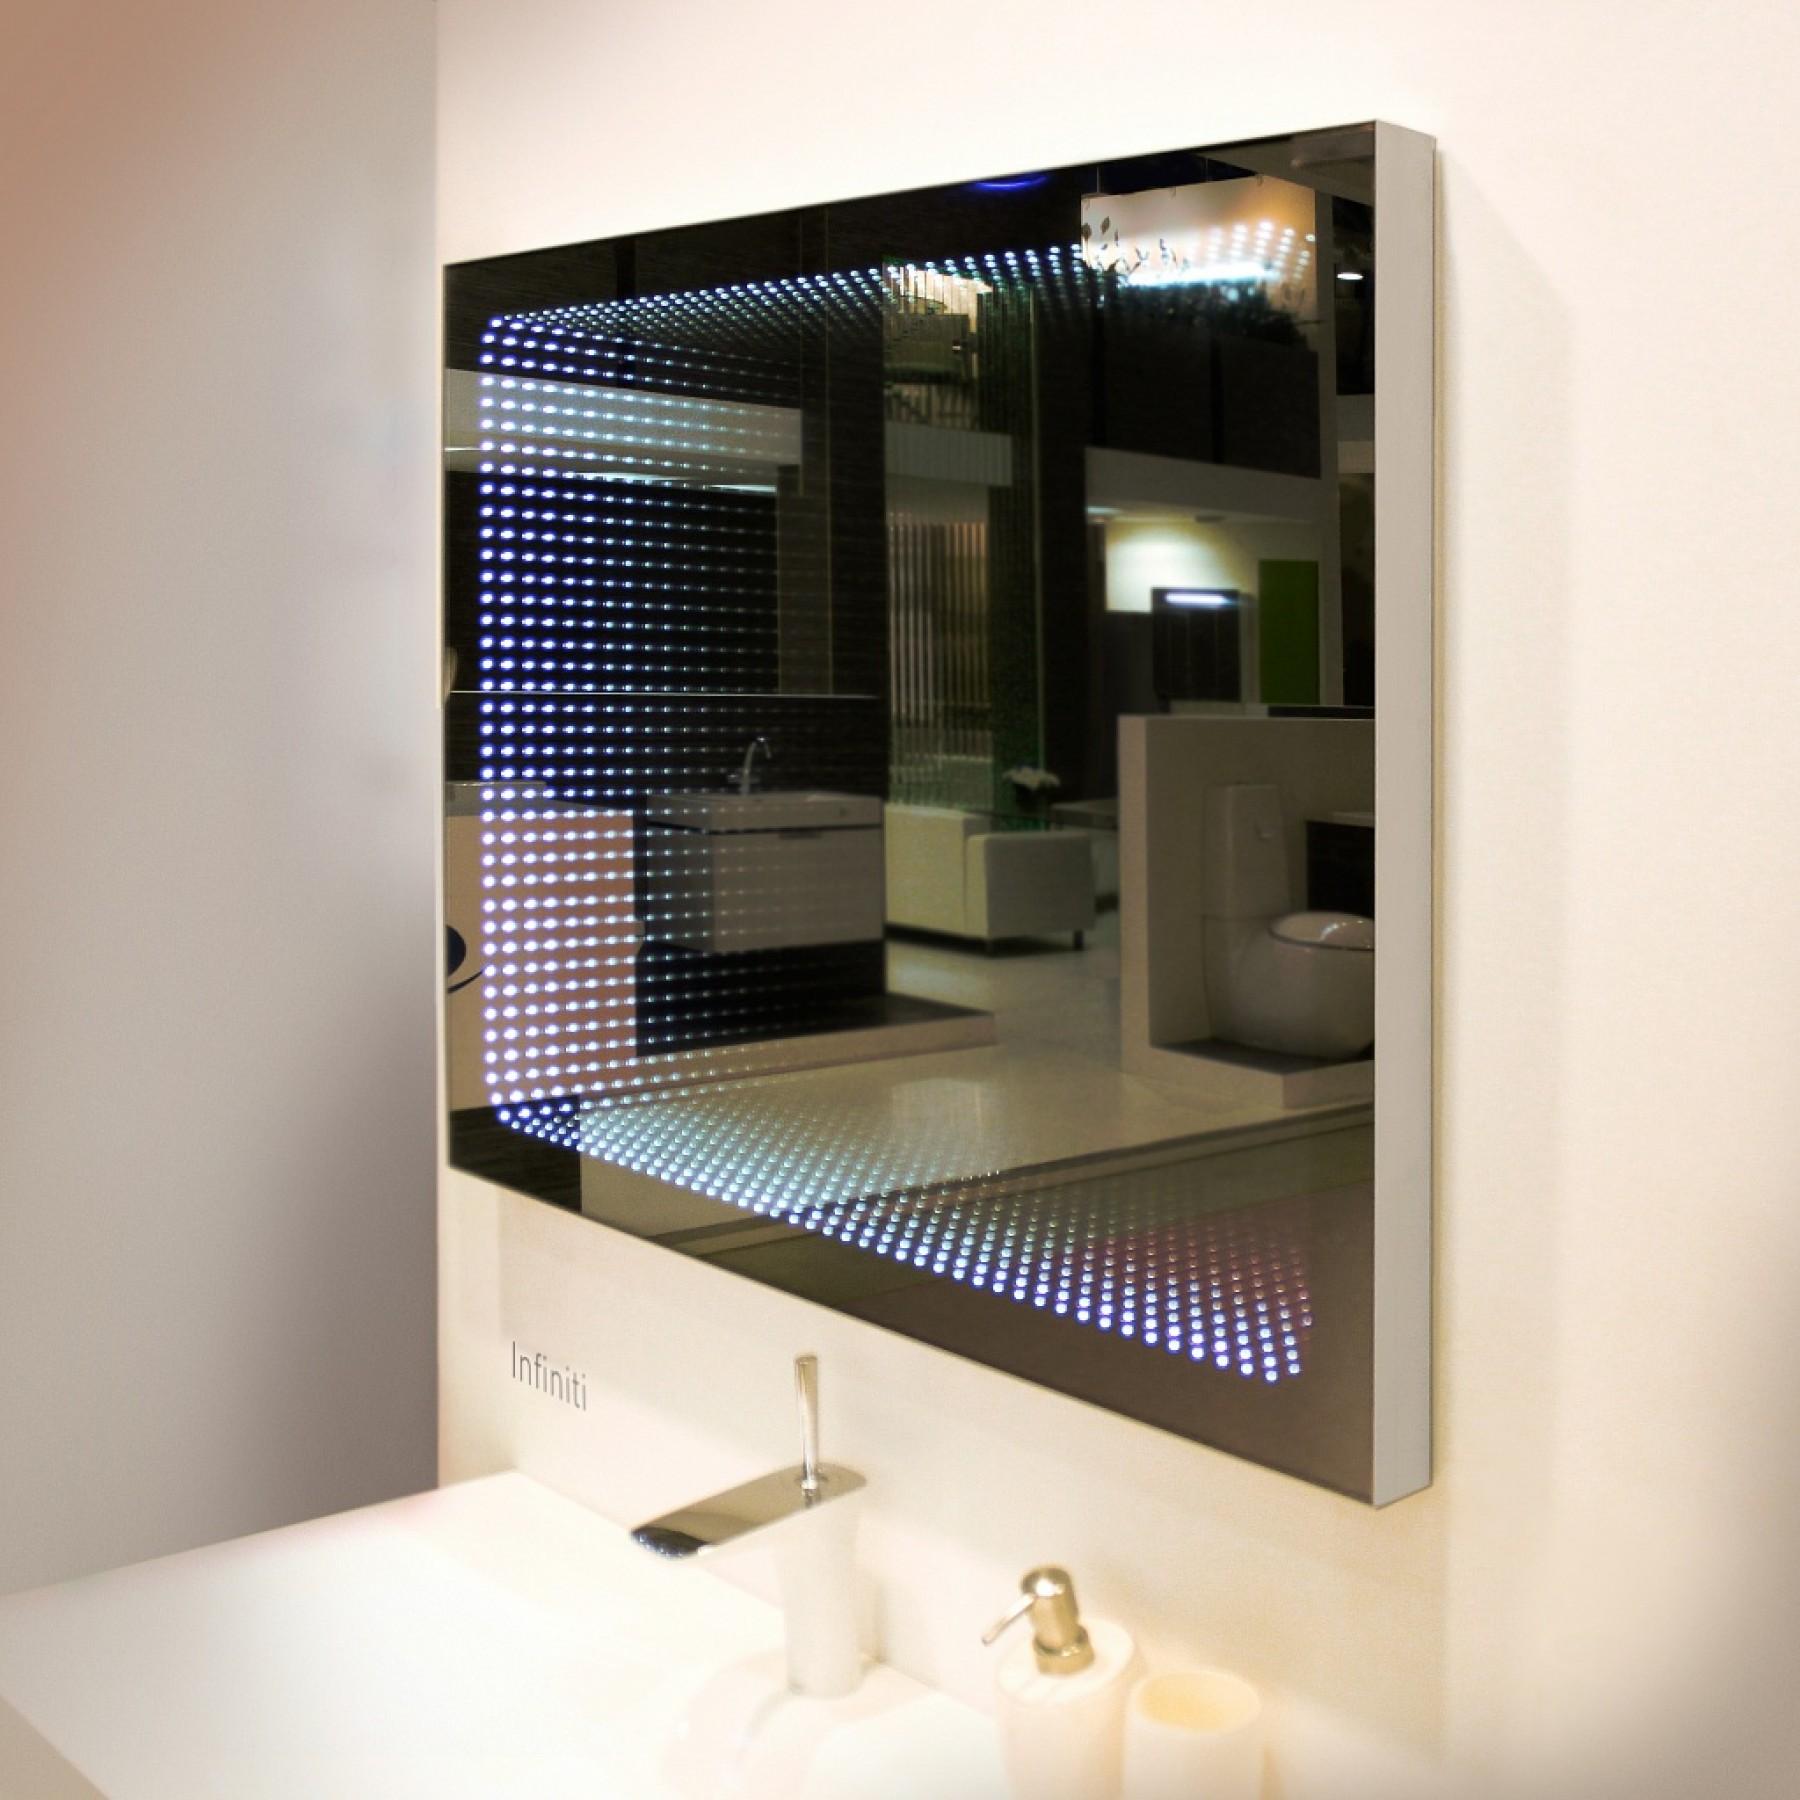 Зеркало с подсветкой Infiniti 60